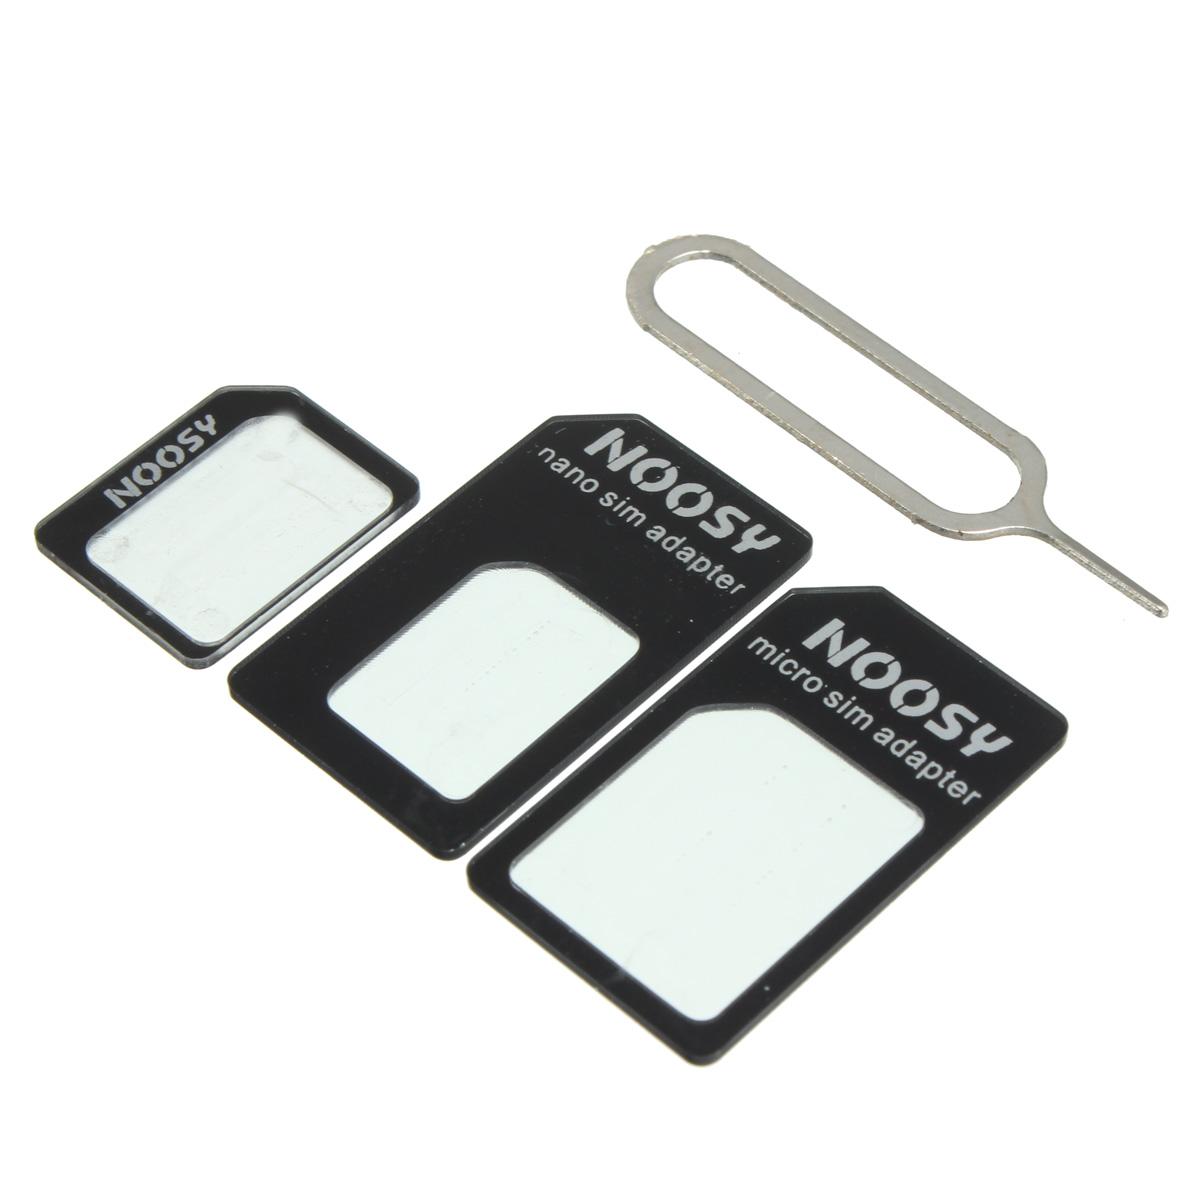 Adapter Sim Card Iphone